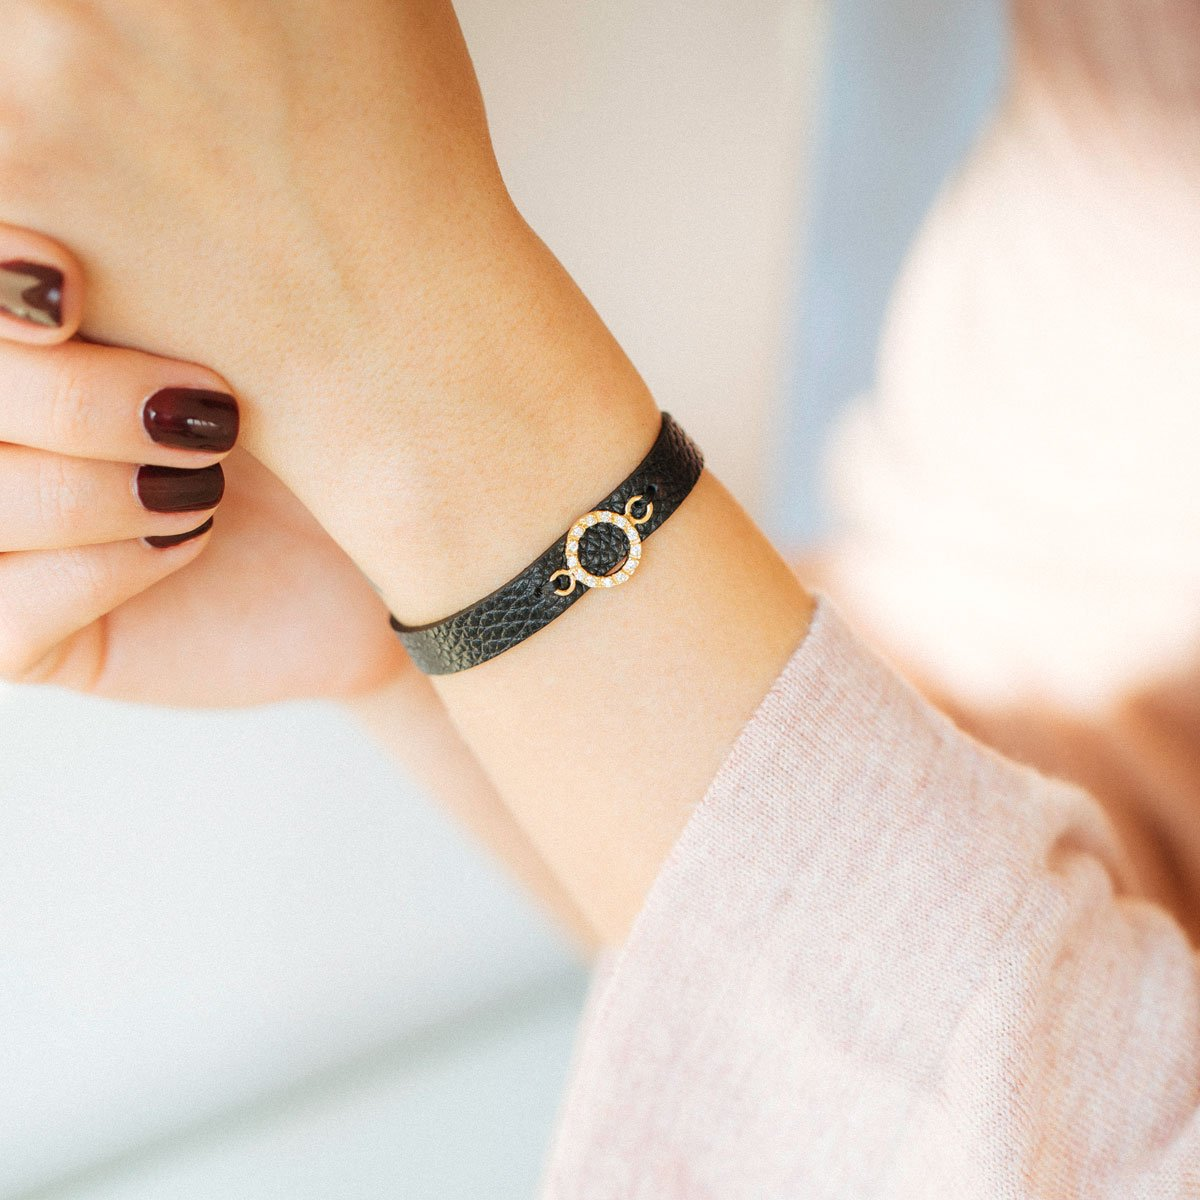 دستبند طلا دایره کوچک ۲